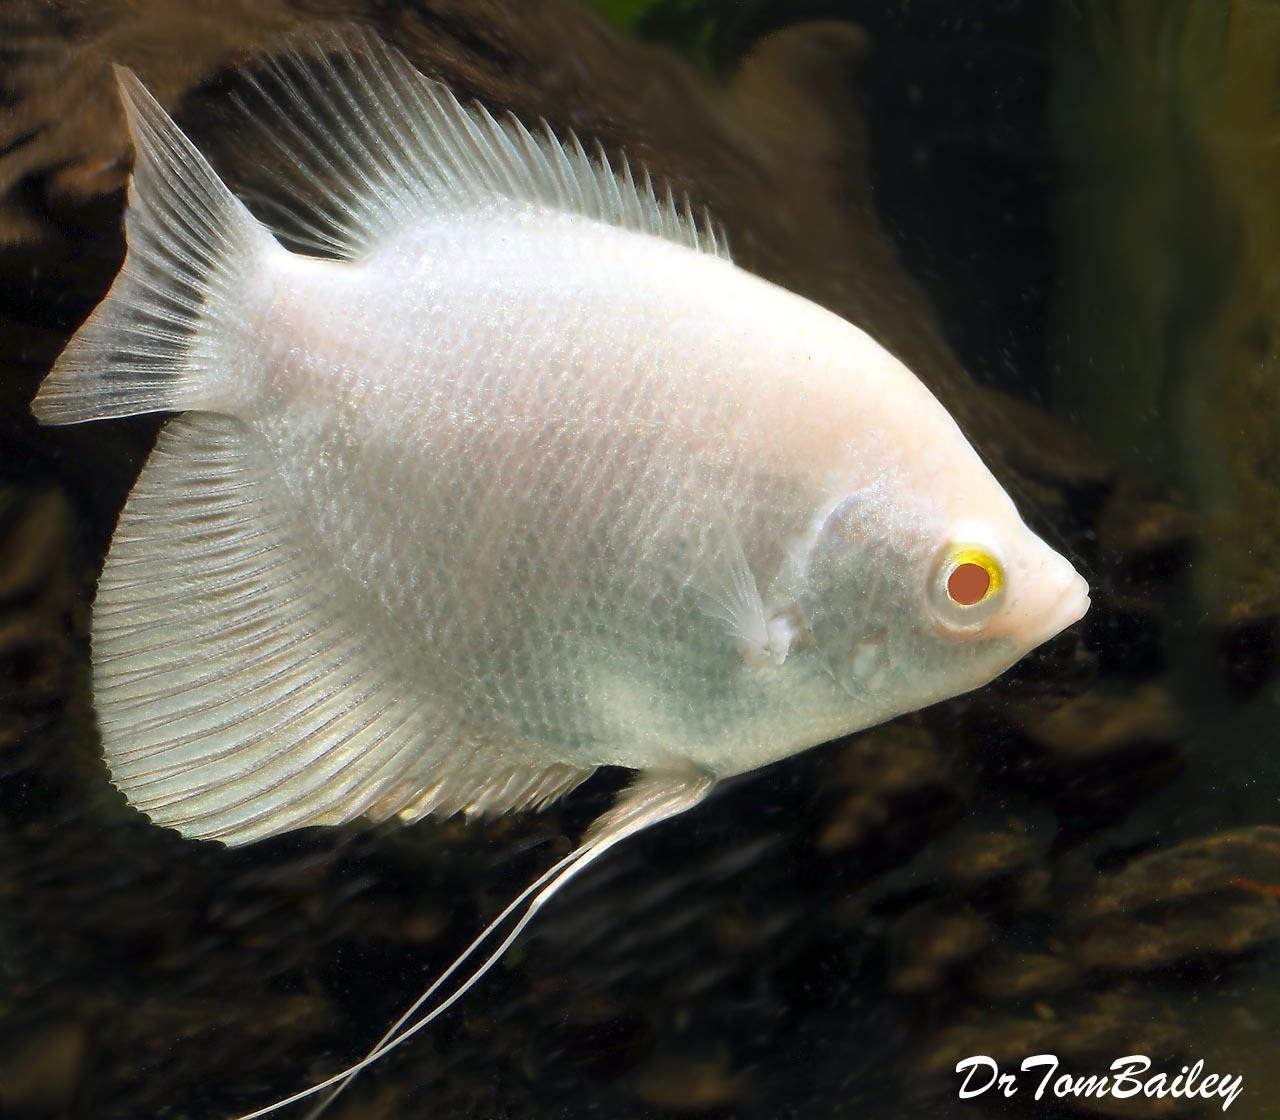 "Premium Rare, New, WYSIWYG, Albino Giant Osphronemus Goramy, 4"" to 5"" long"